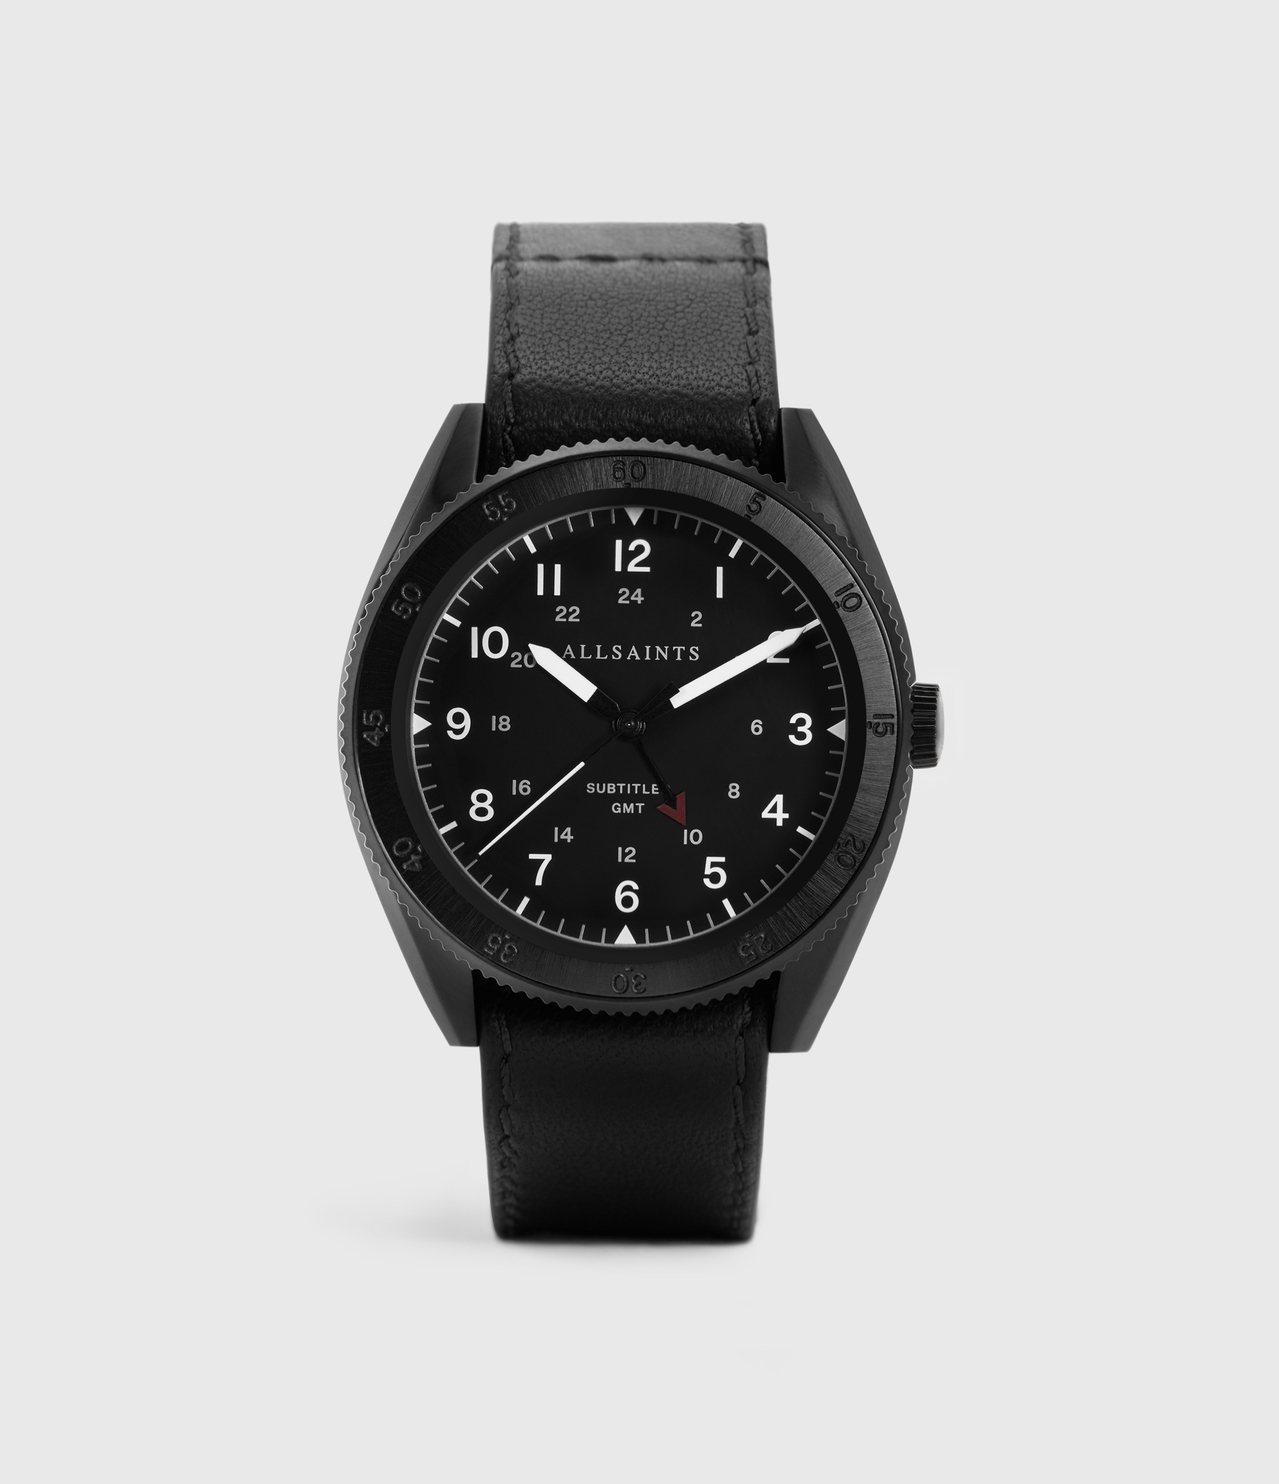 ALLSAINTS subtitled系列兩地時間腕錶,黑色表盤搭配皮革表帶,9...